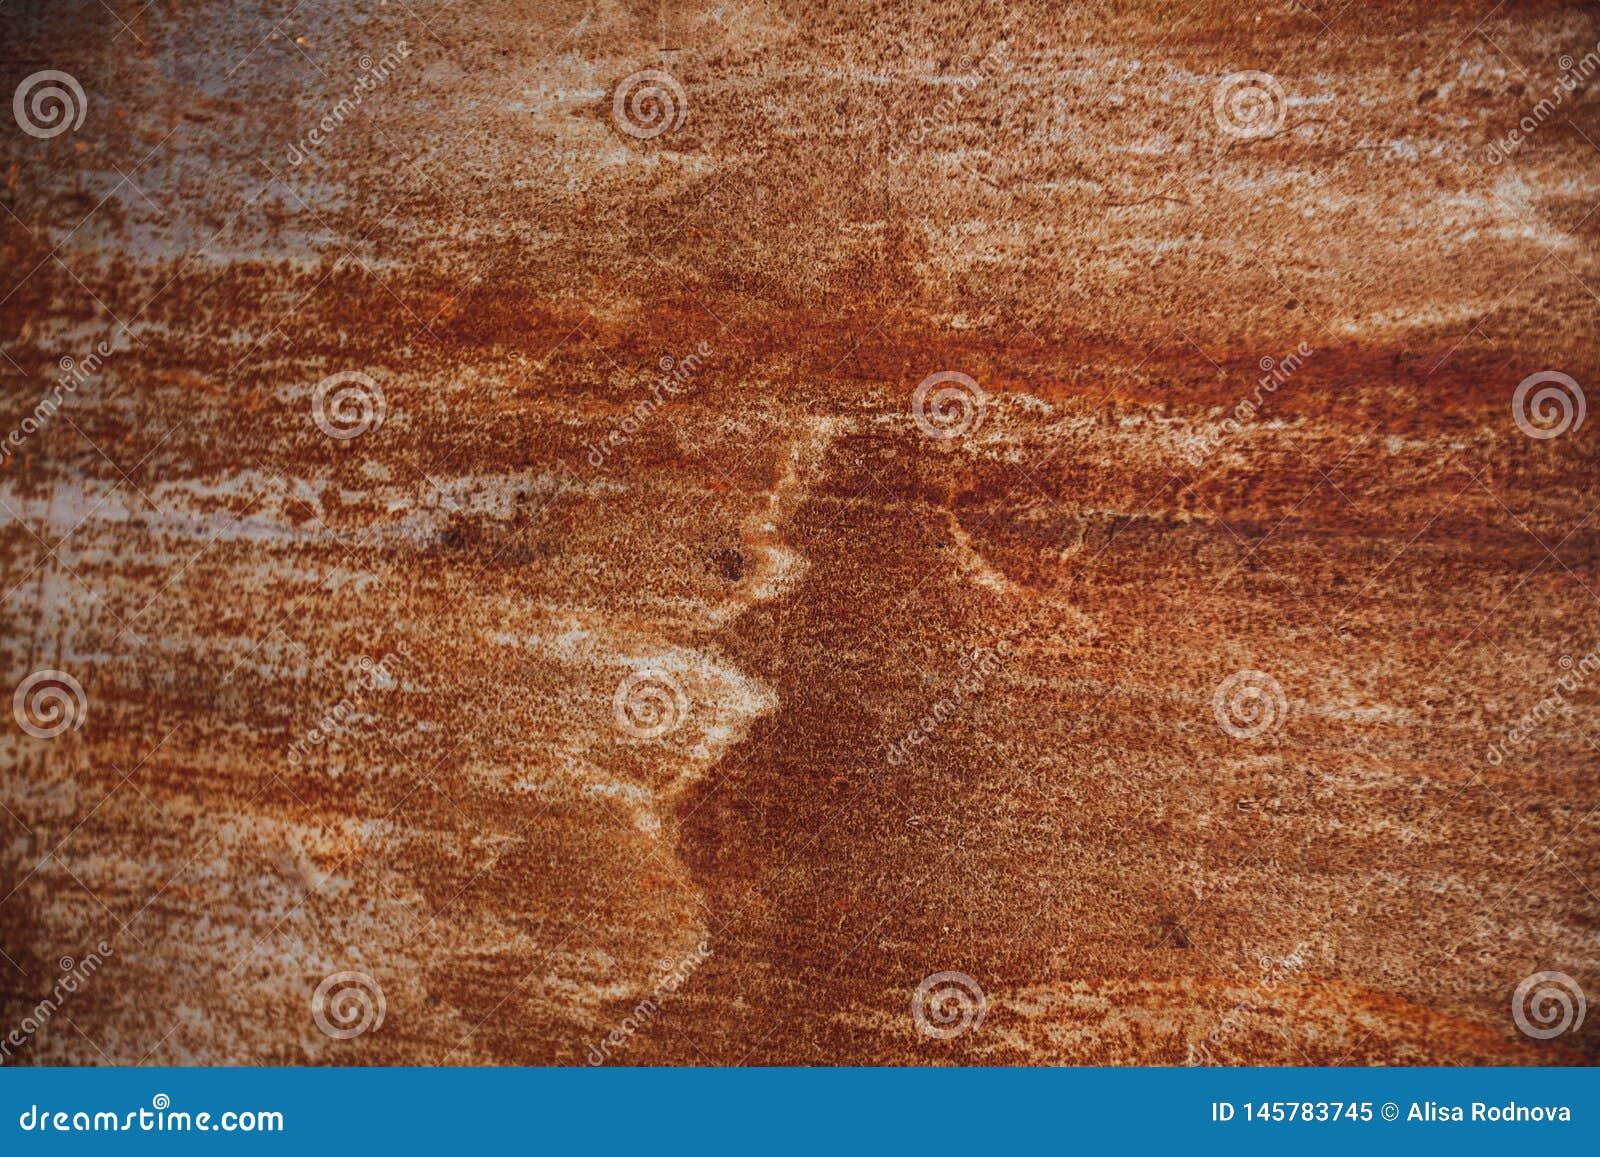 Ржавый лист утюга